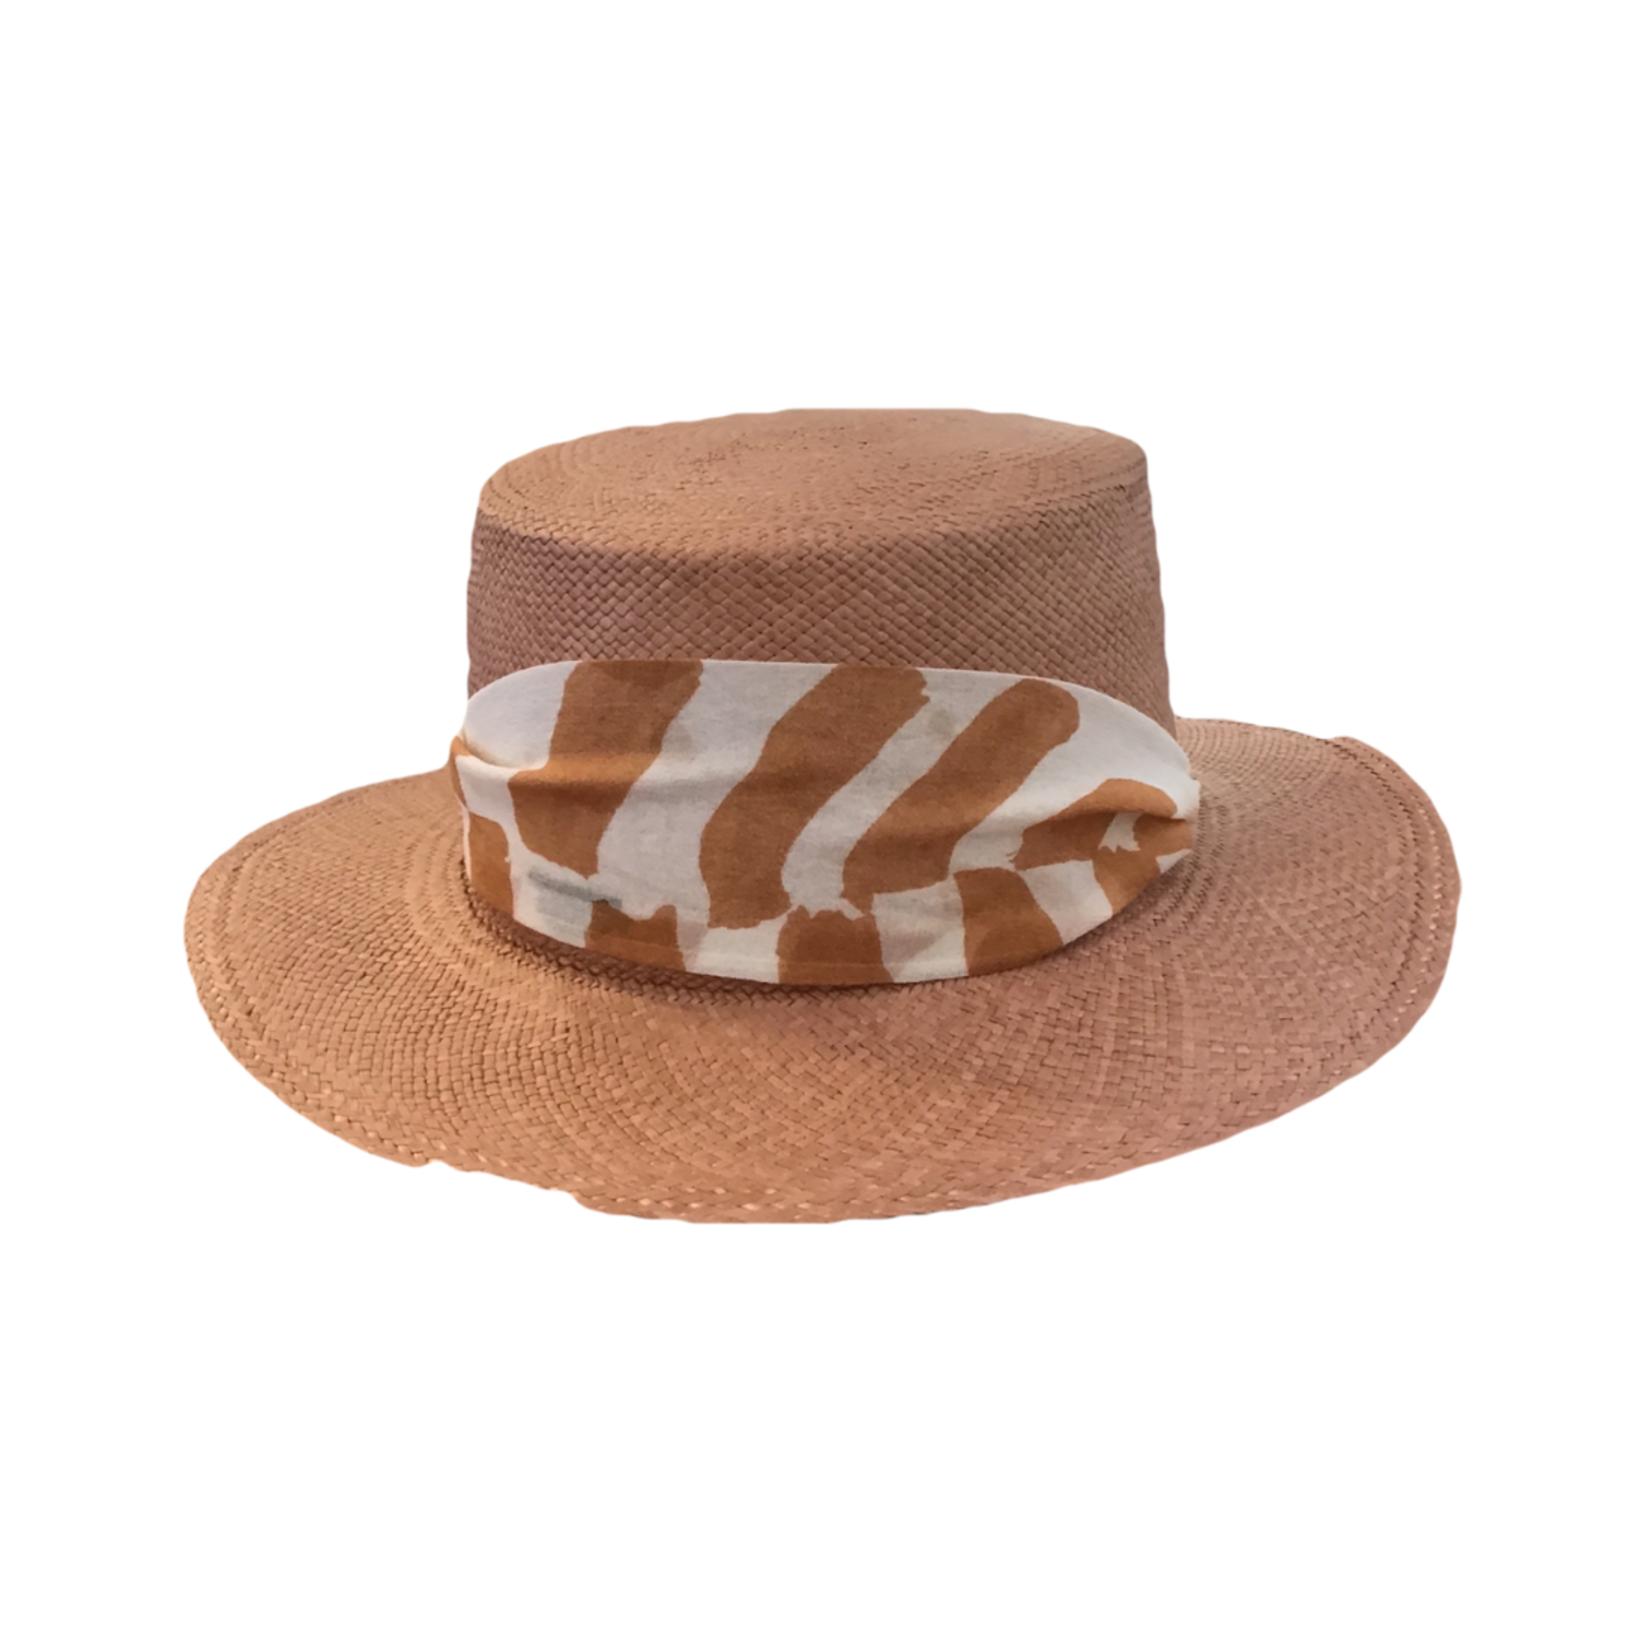 Modern Monarchie Palma Straw Hat